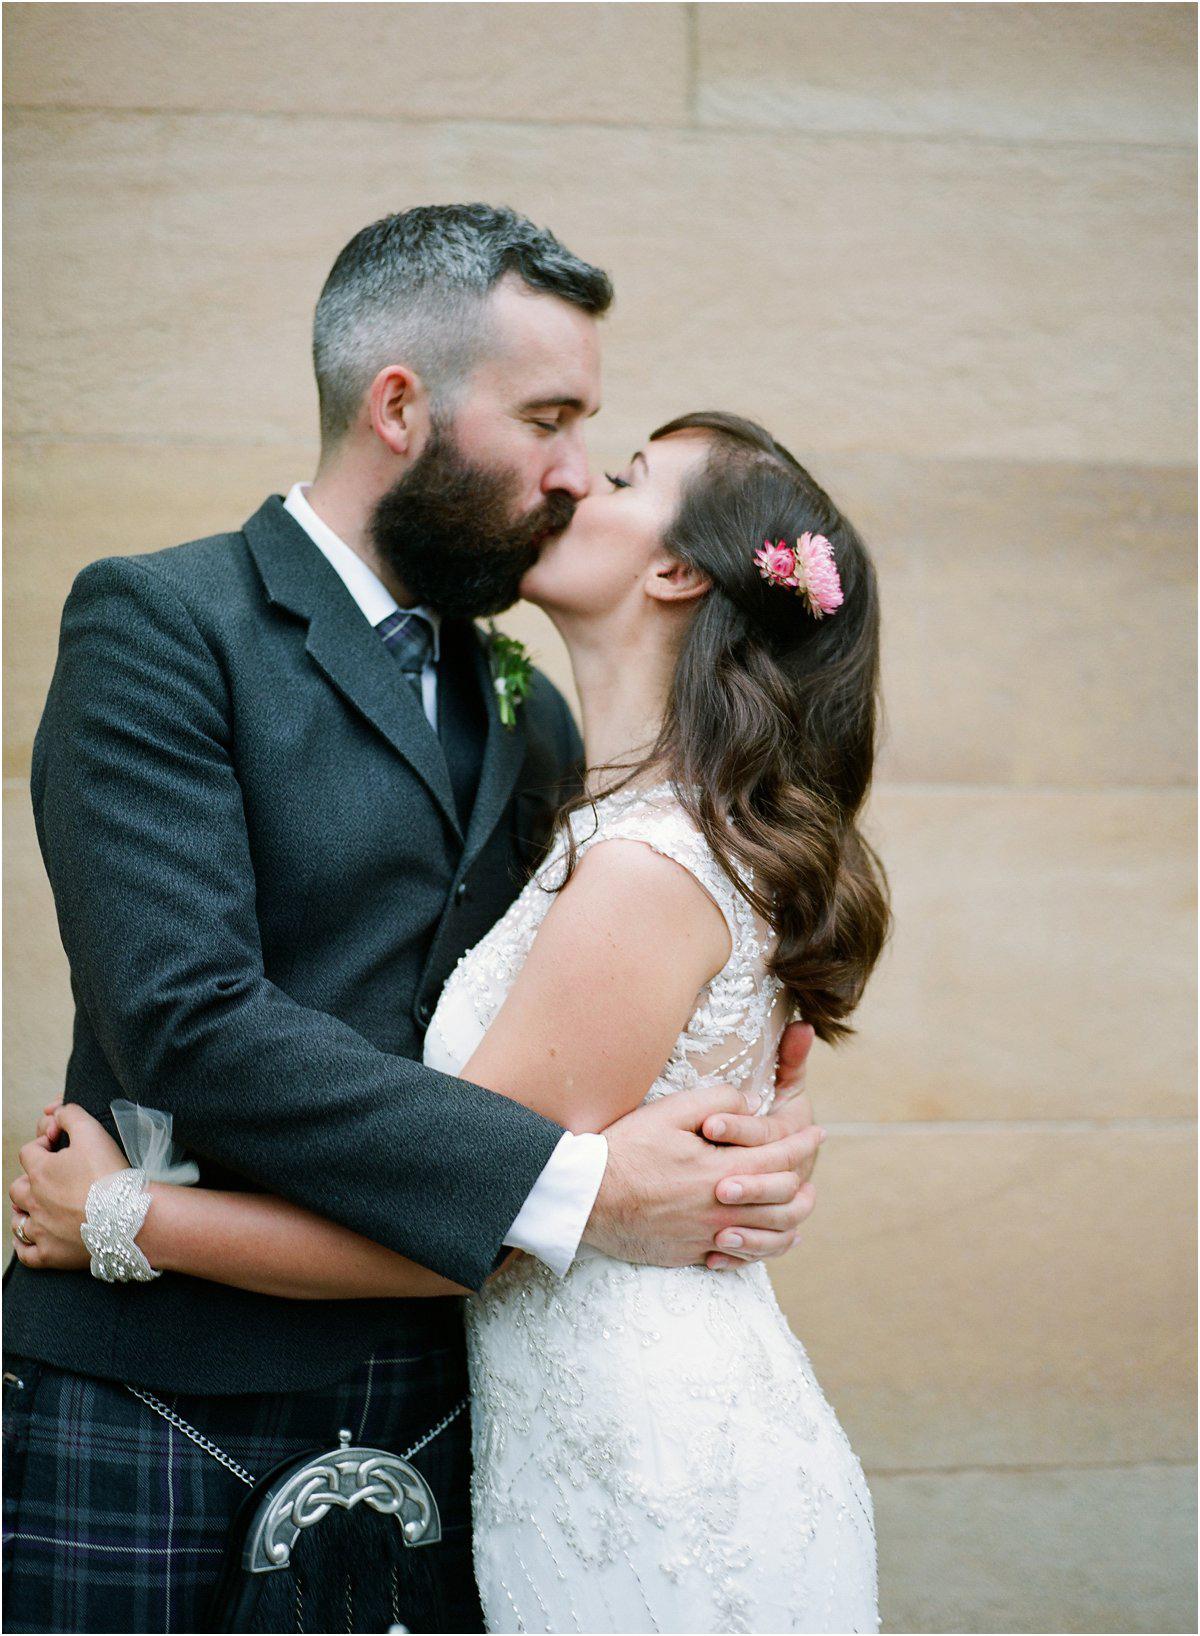 Crofts & Kowalczyk Best Wedding Photography Scotland Blogpost-96.jpg